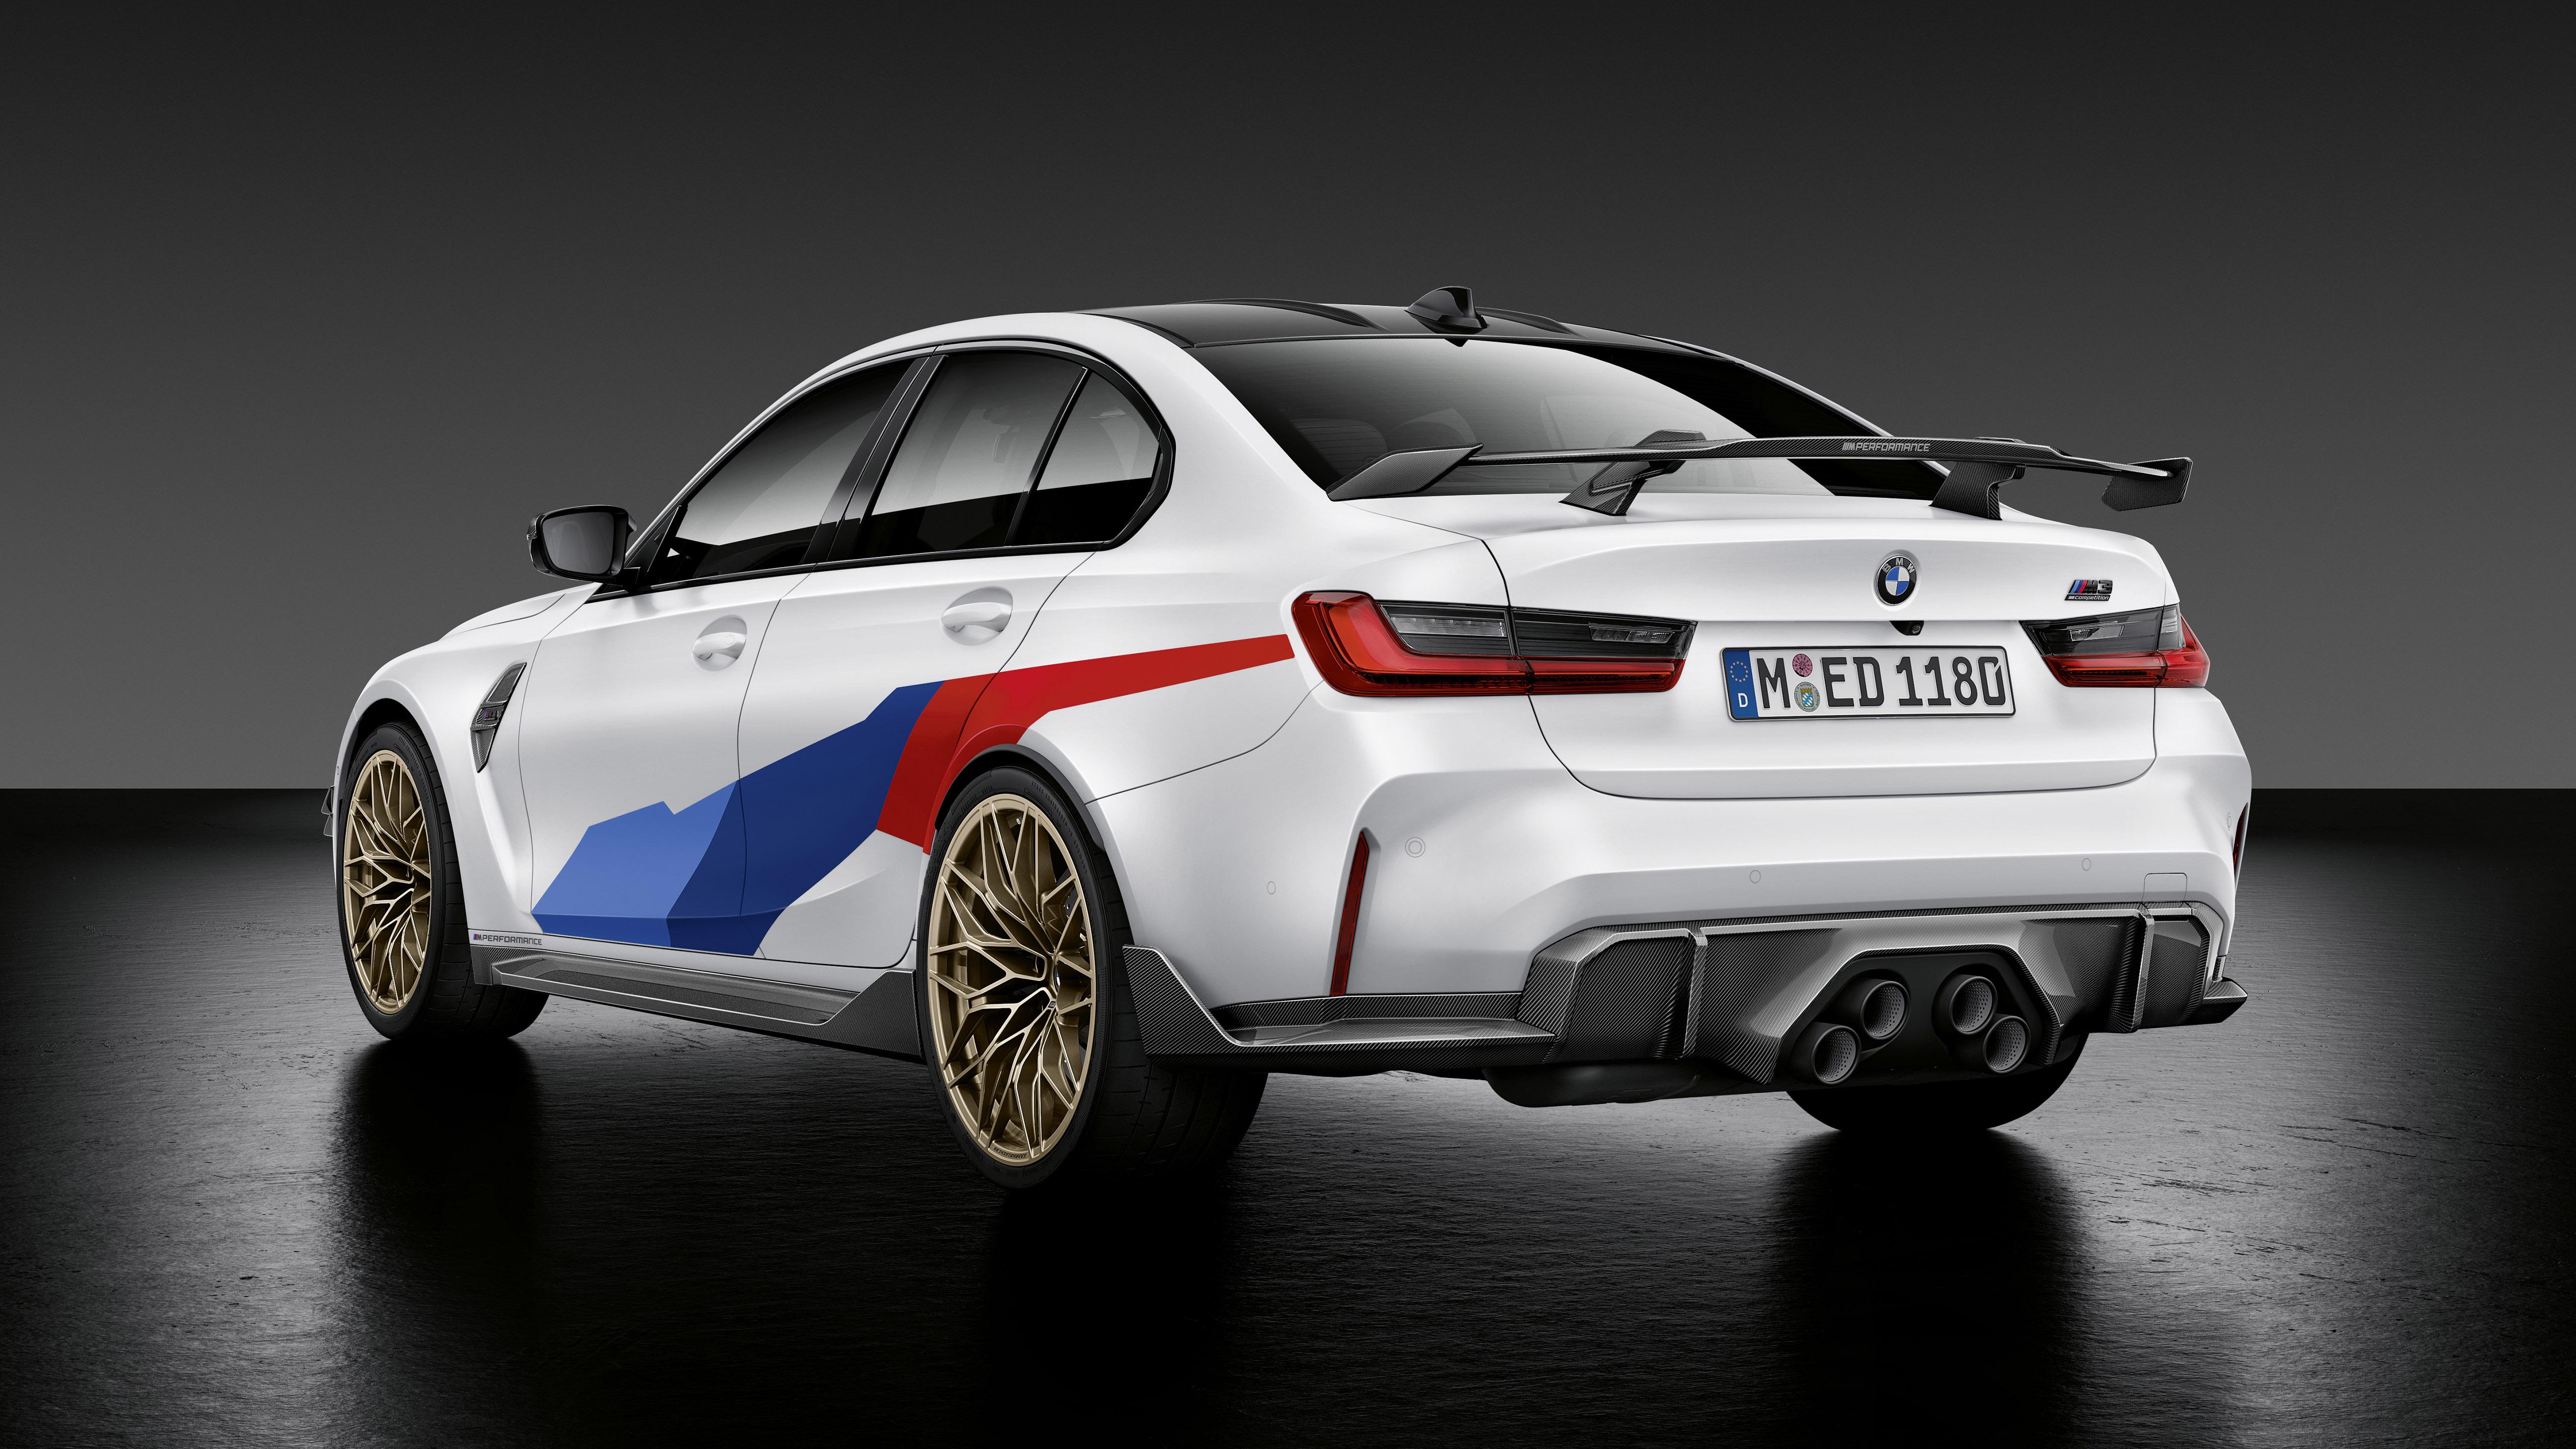 BMW M3 Competition M Performance Parts 2020 5K 2 Wallpaper ...